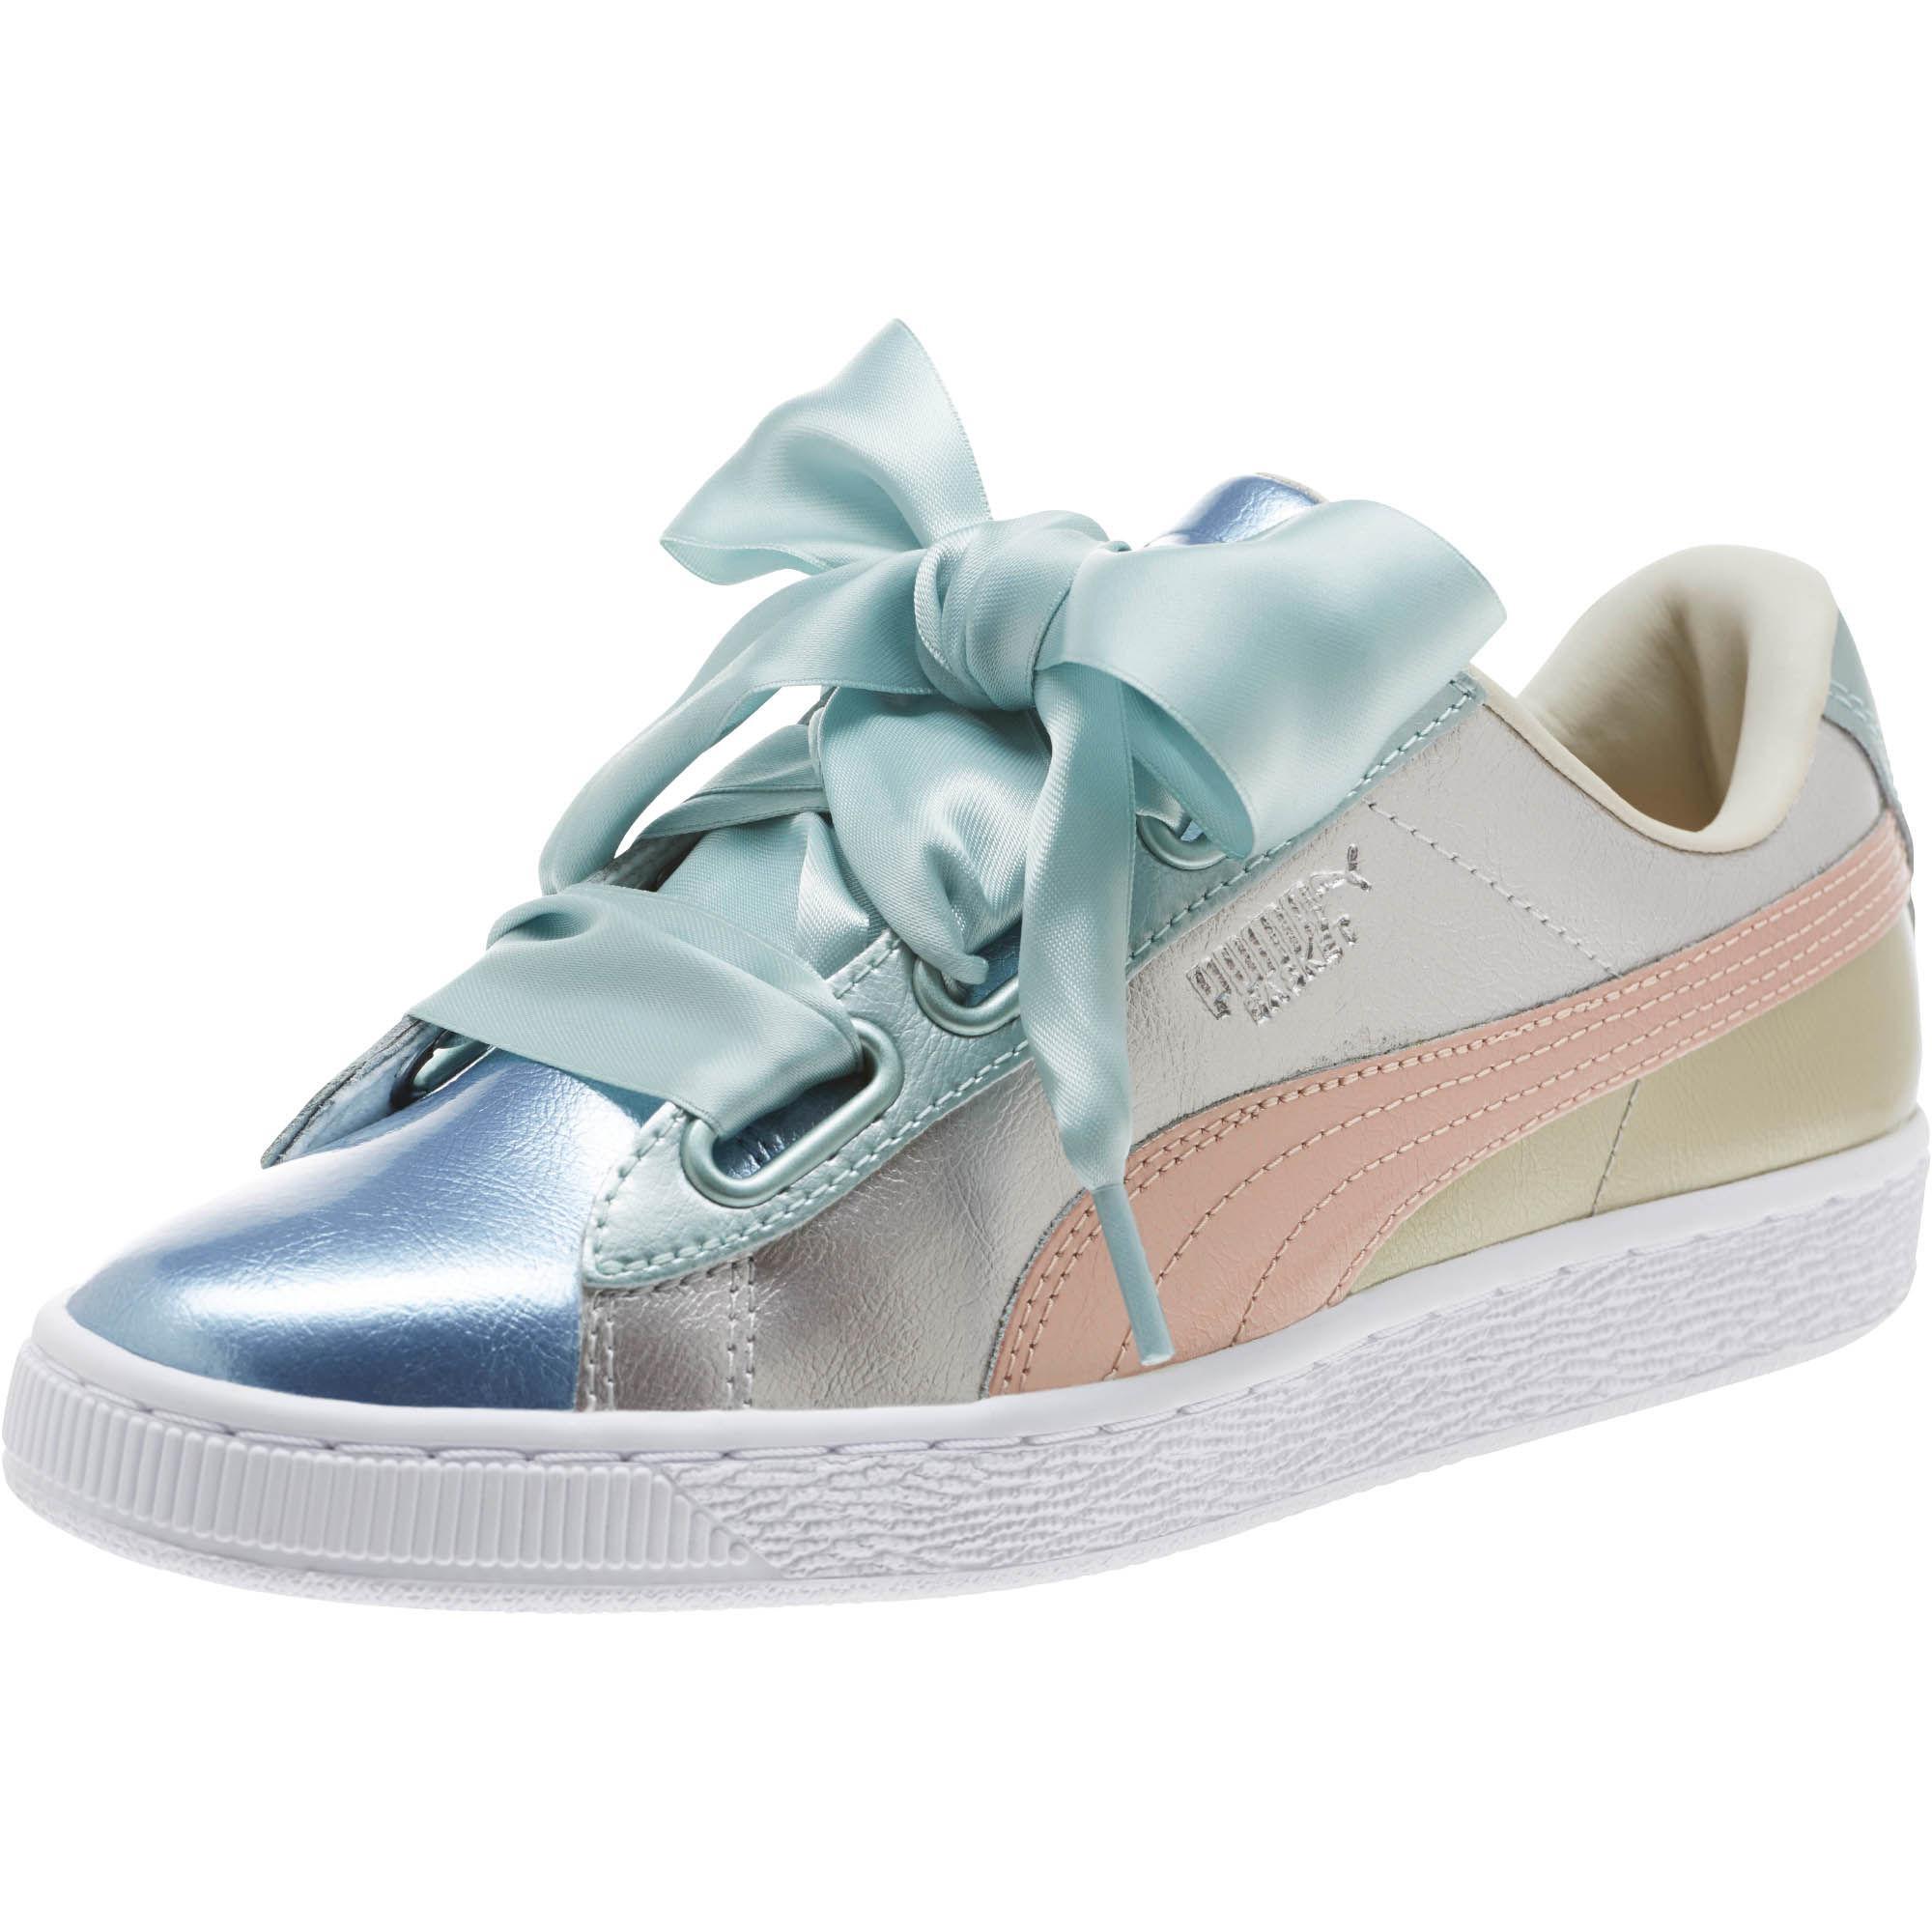 wholesale dealer 99db0 8cc4b PUMA Metallic Basket Heart Bauble Women's Sneakers